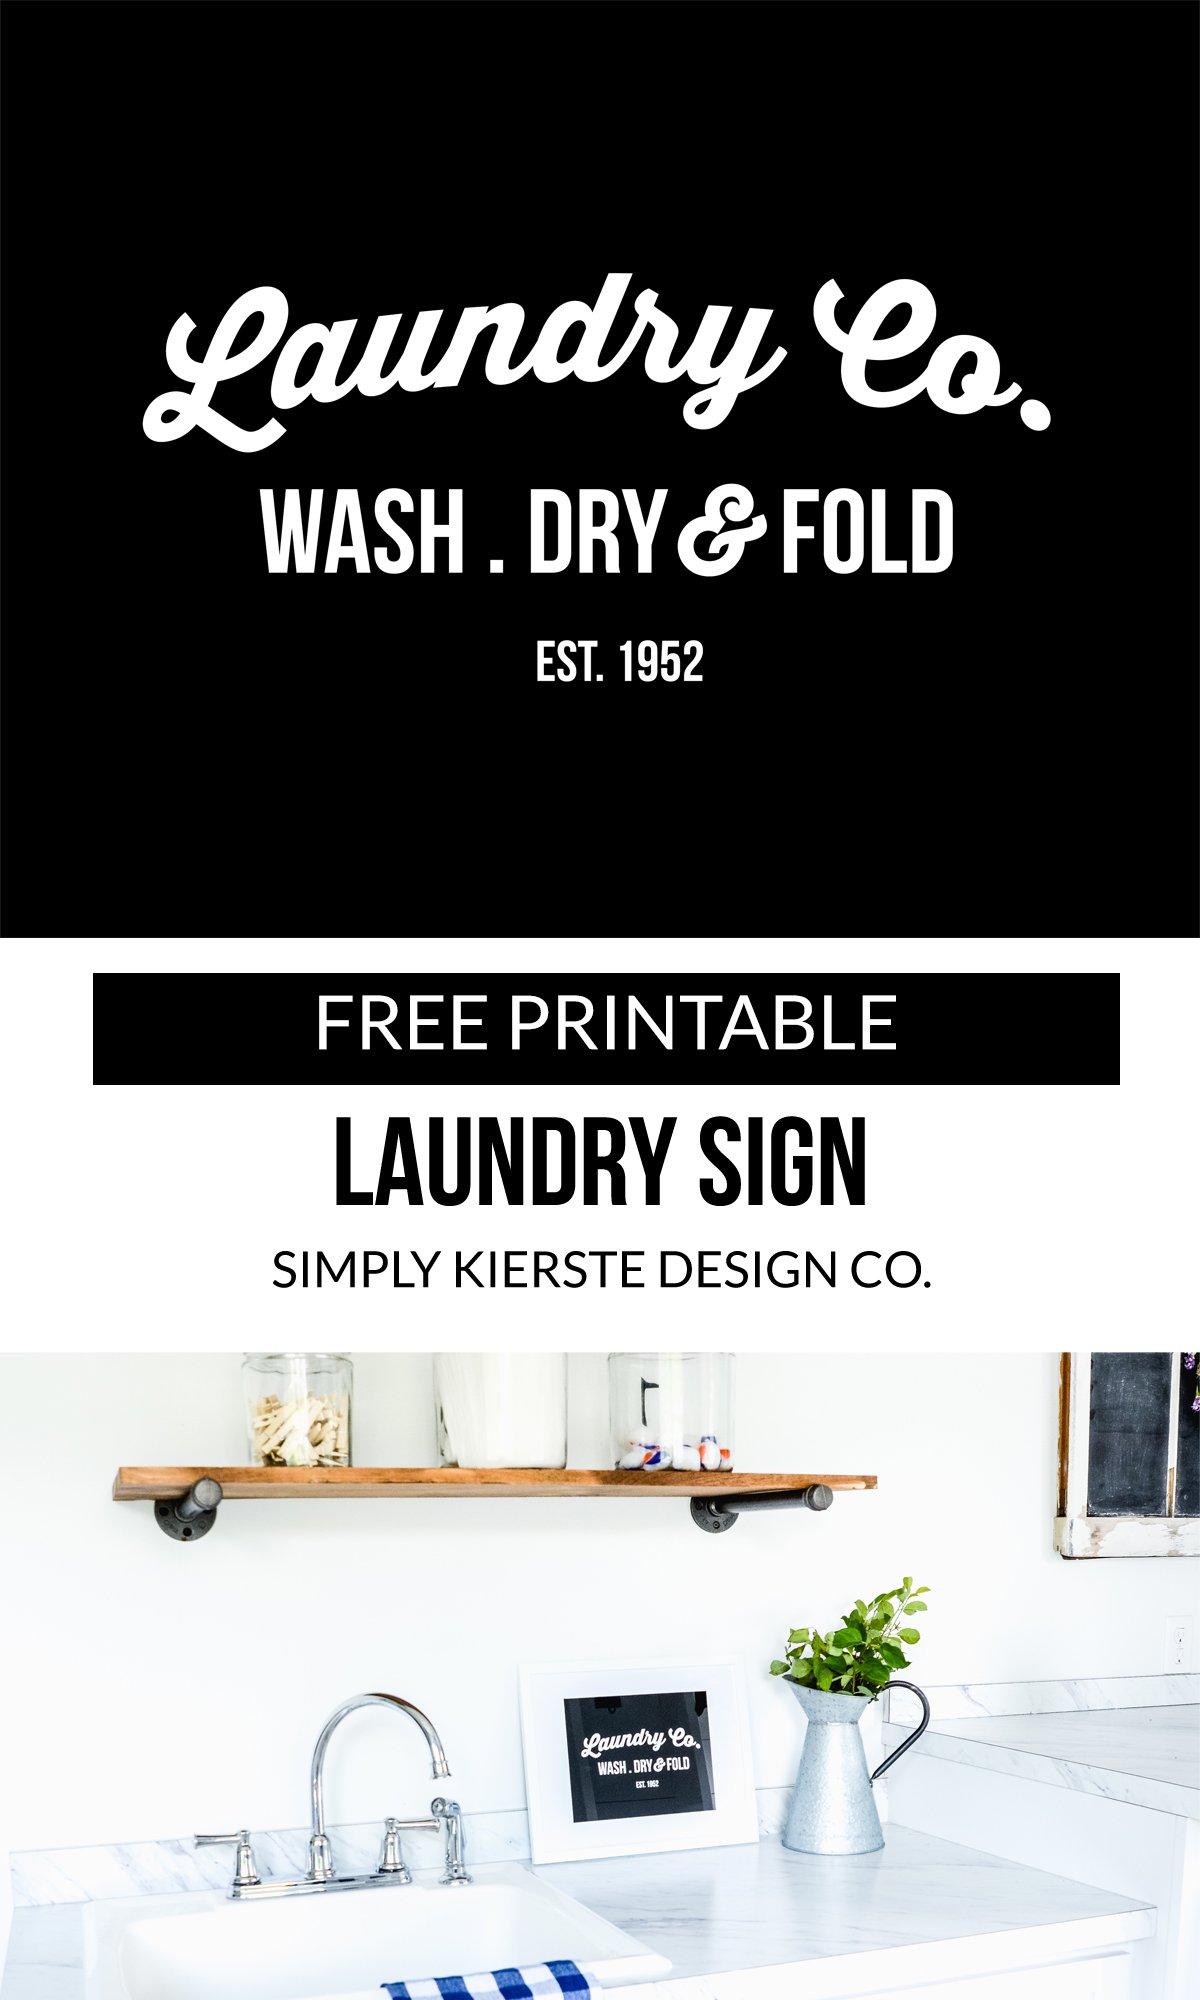 Free Printable Laundry Sign Simply Kierste Design Co